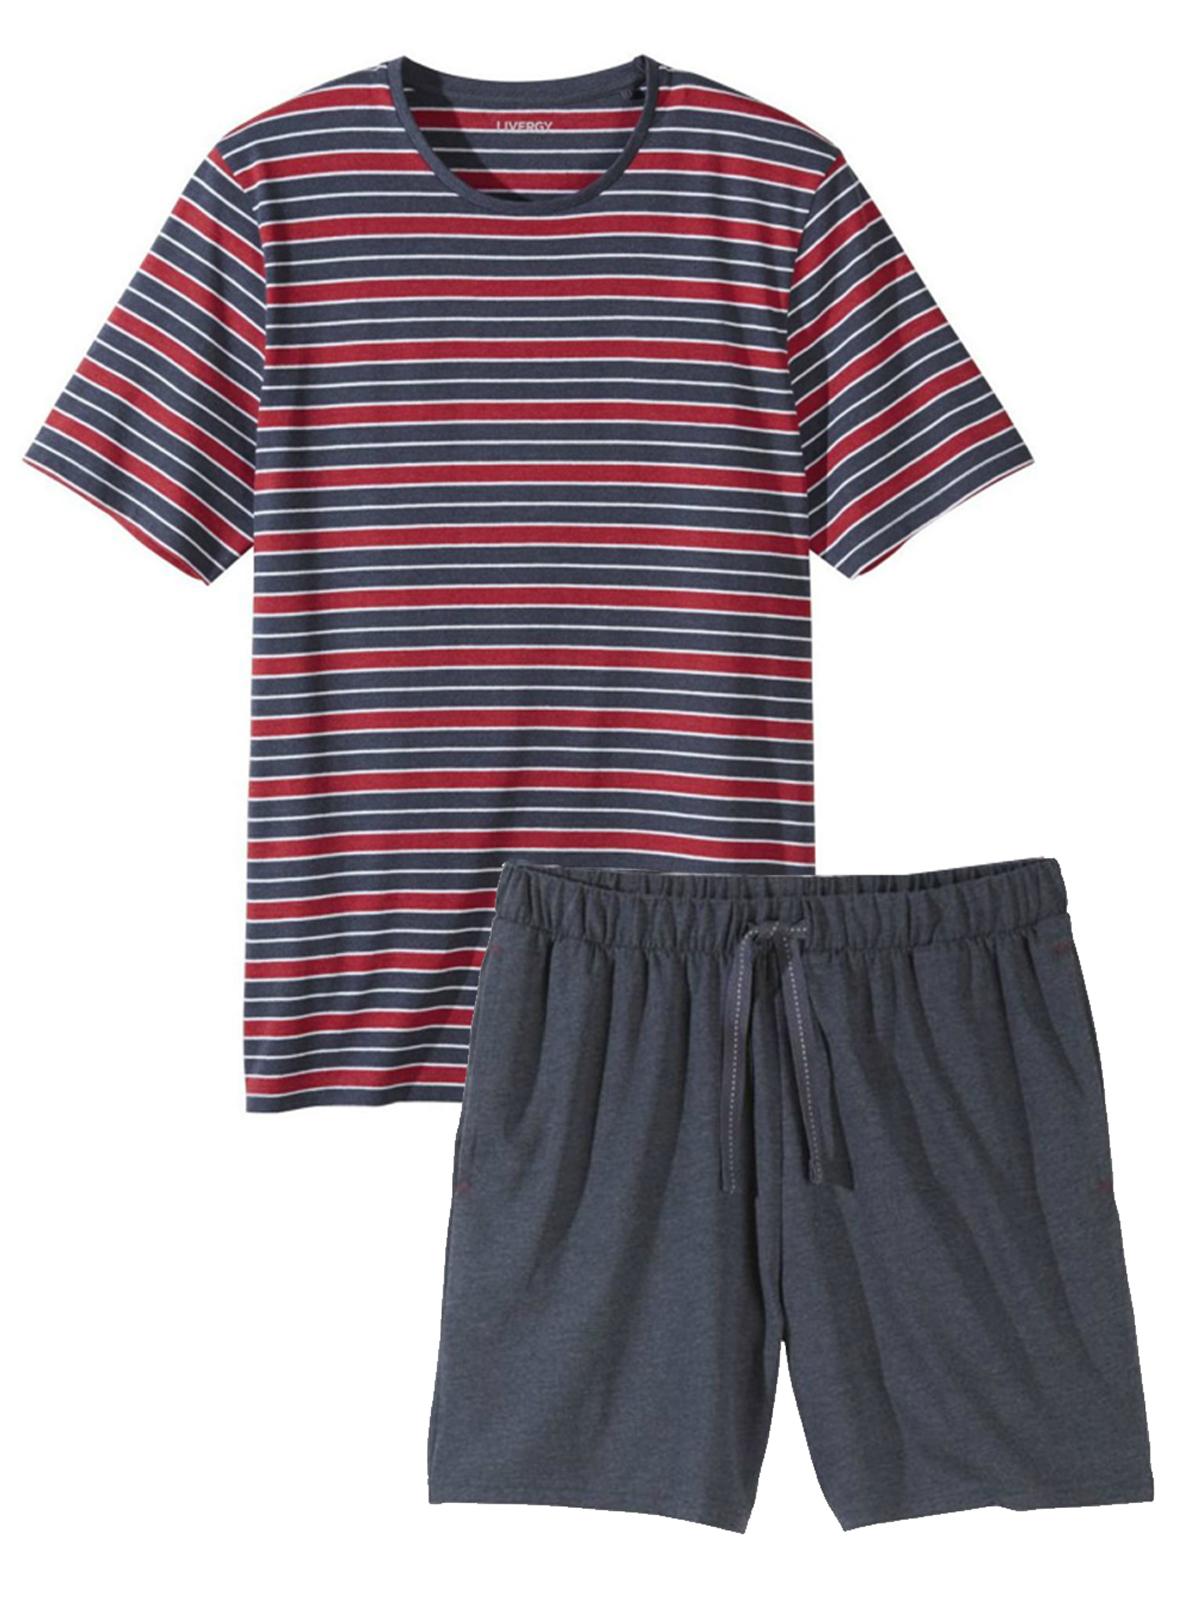 Livergy Mens NAVY RED Stripes Cotton Rich Pyjama Short Set - Size Medium to XLarge